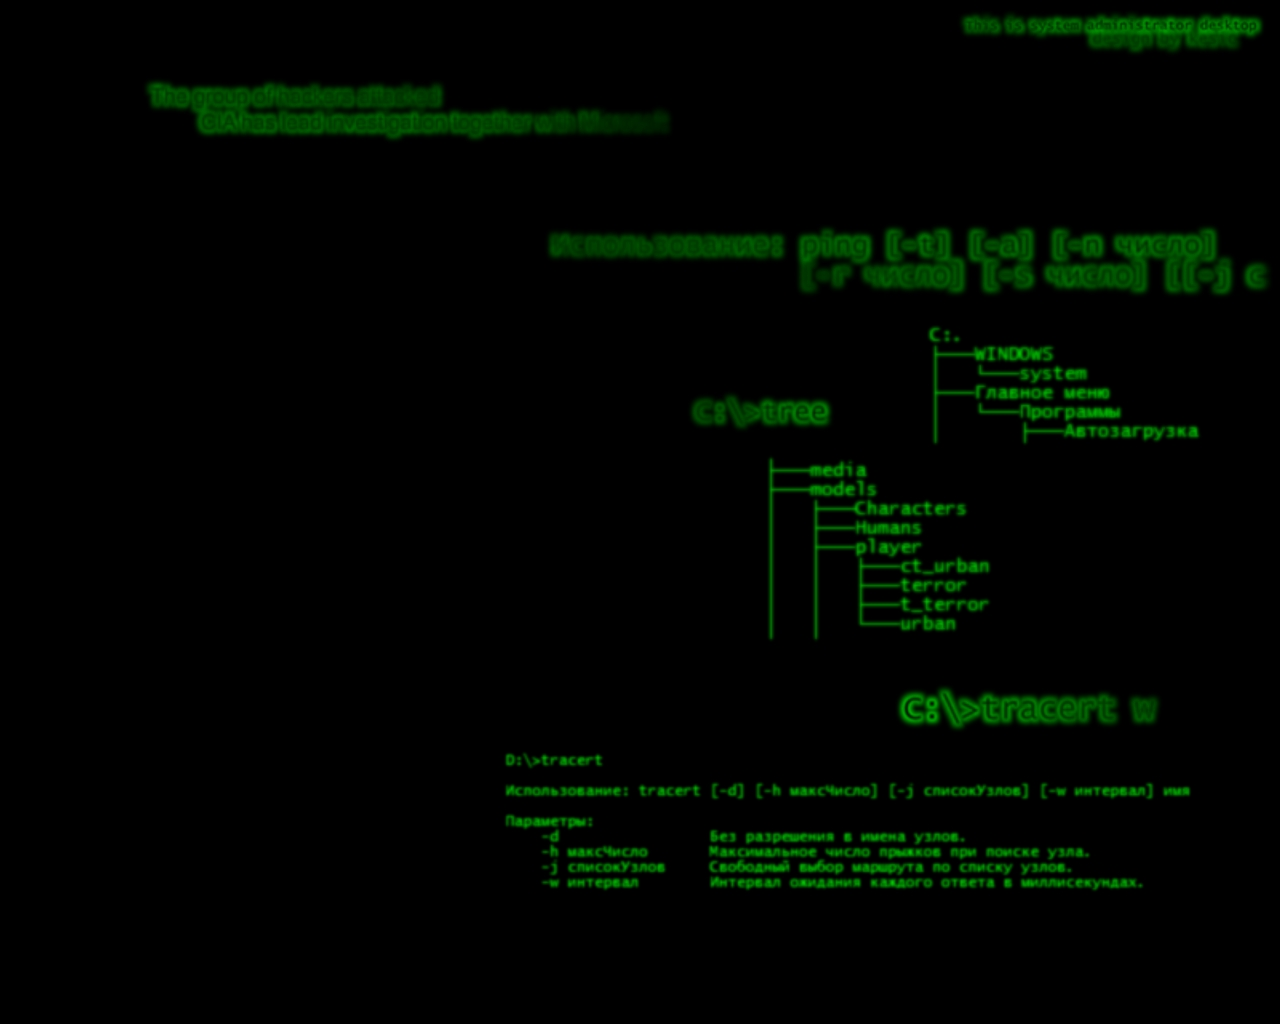 Hack Roots Image Hacker Wallpaper 1280x1024 Full HD Wallpapers 1280x1024